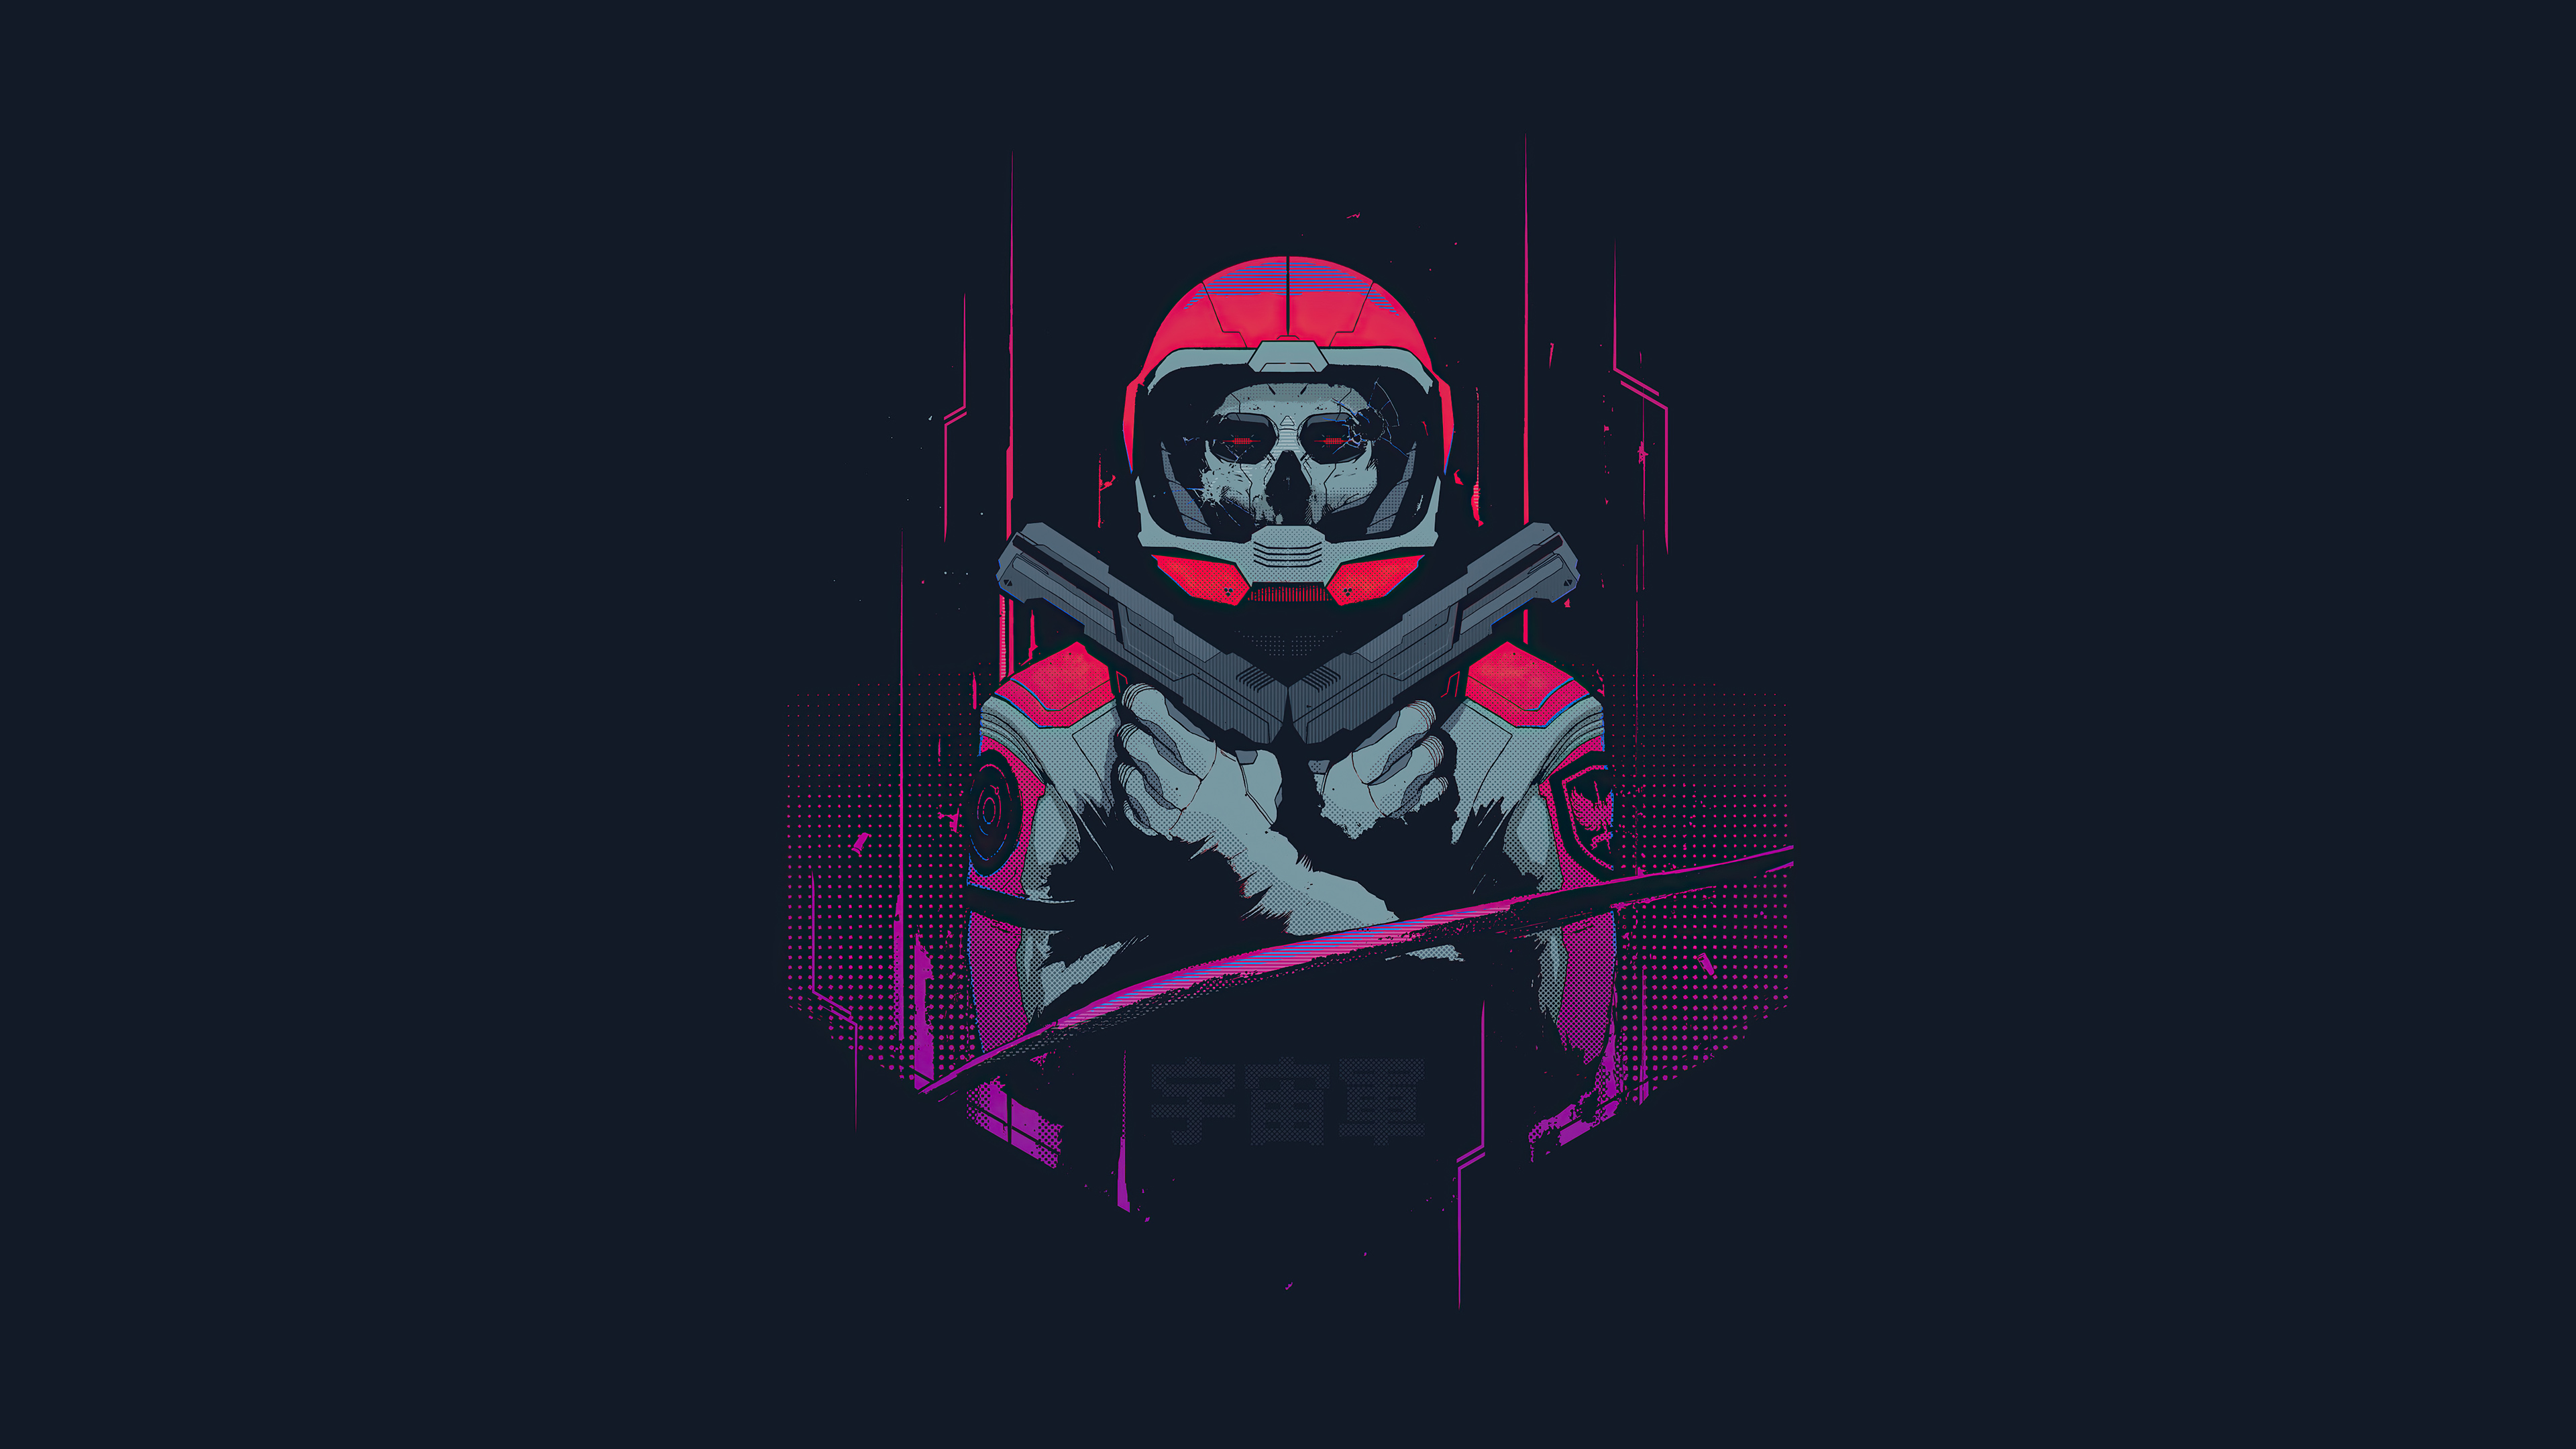 cyberpunk astronaut minimal 4k 1618133007 - Cyberpunk Astronaut Minimal 4k - Cyberpunk Astronaut Minimal 4k wallpapers